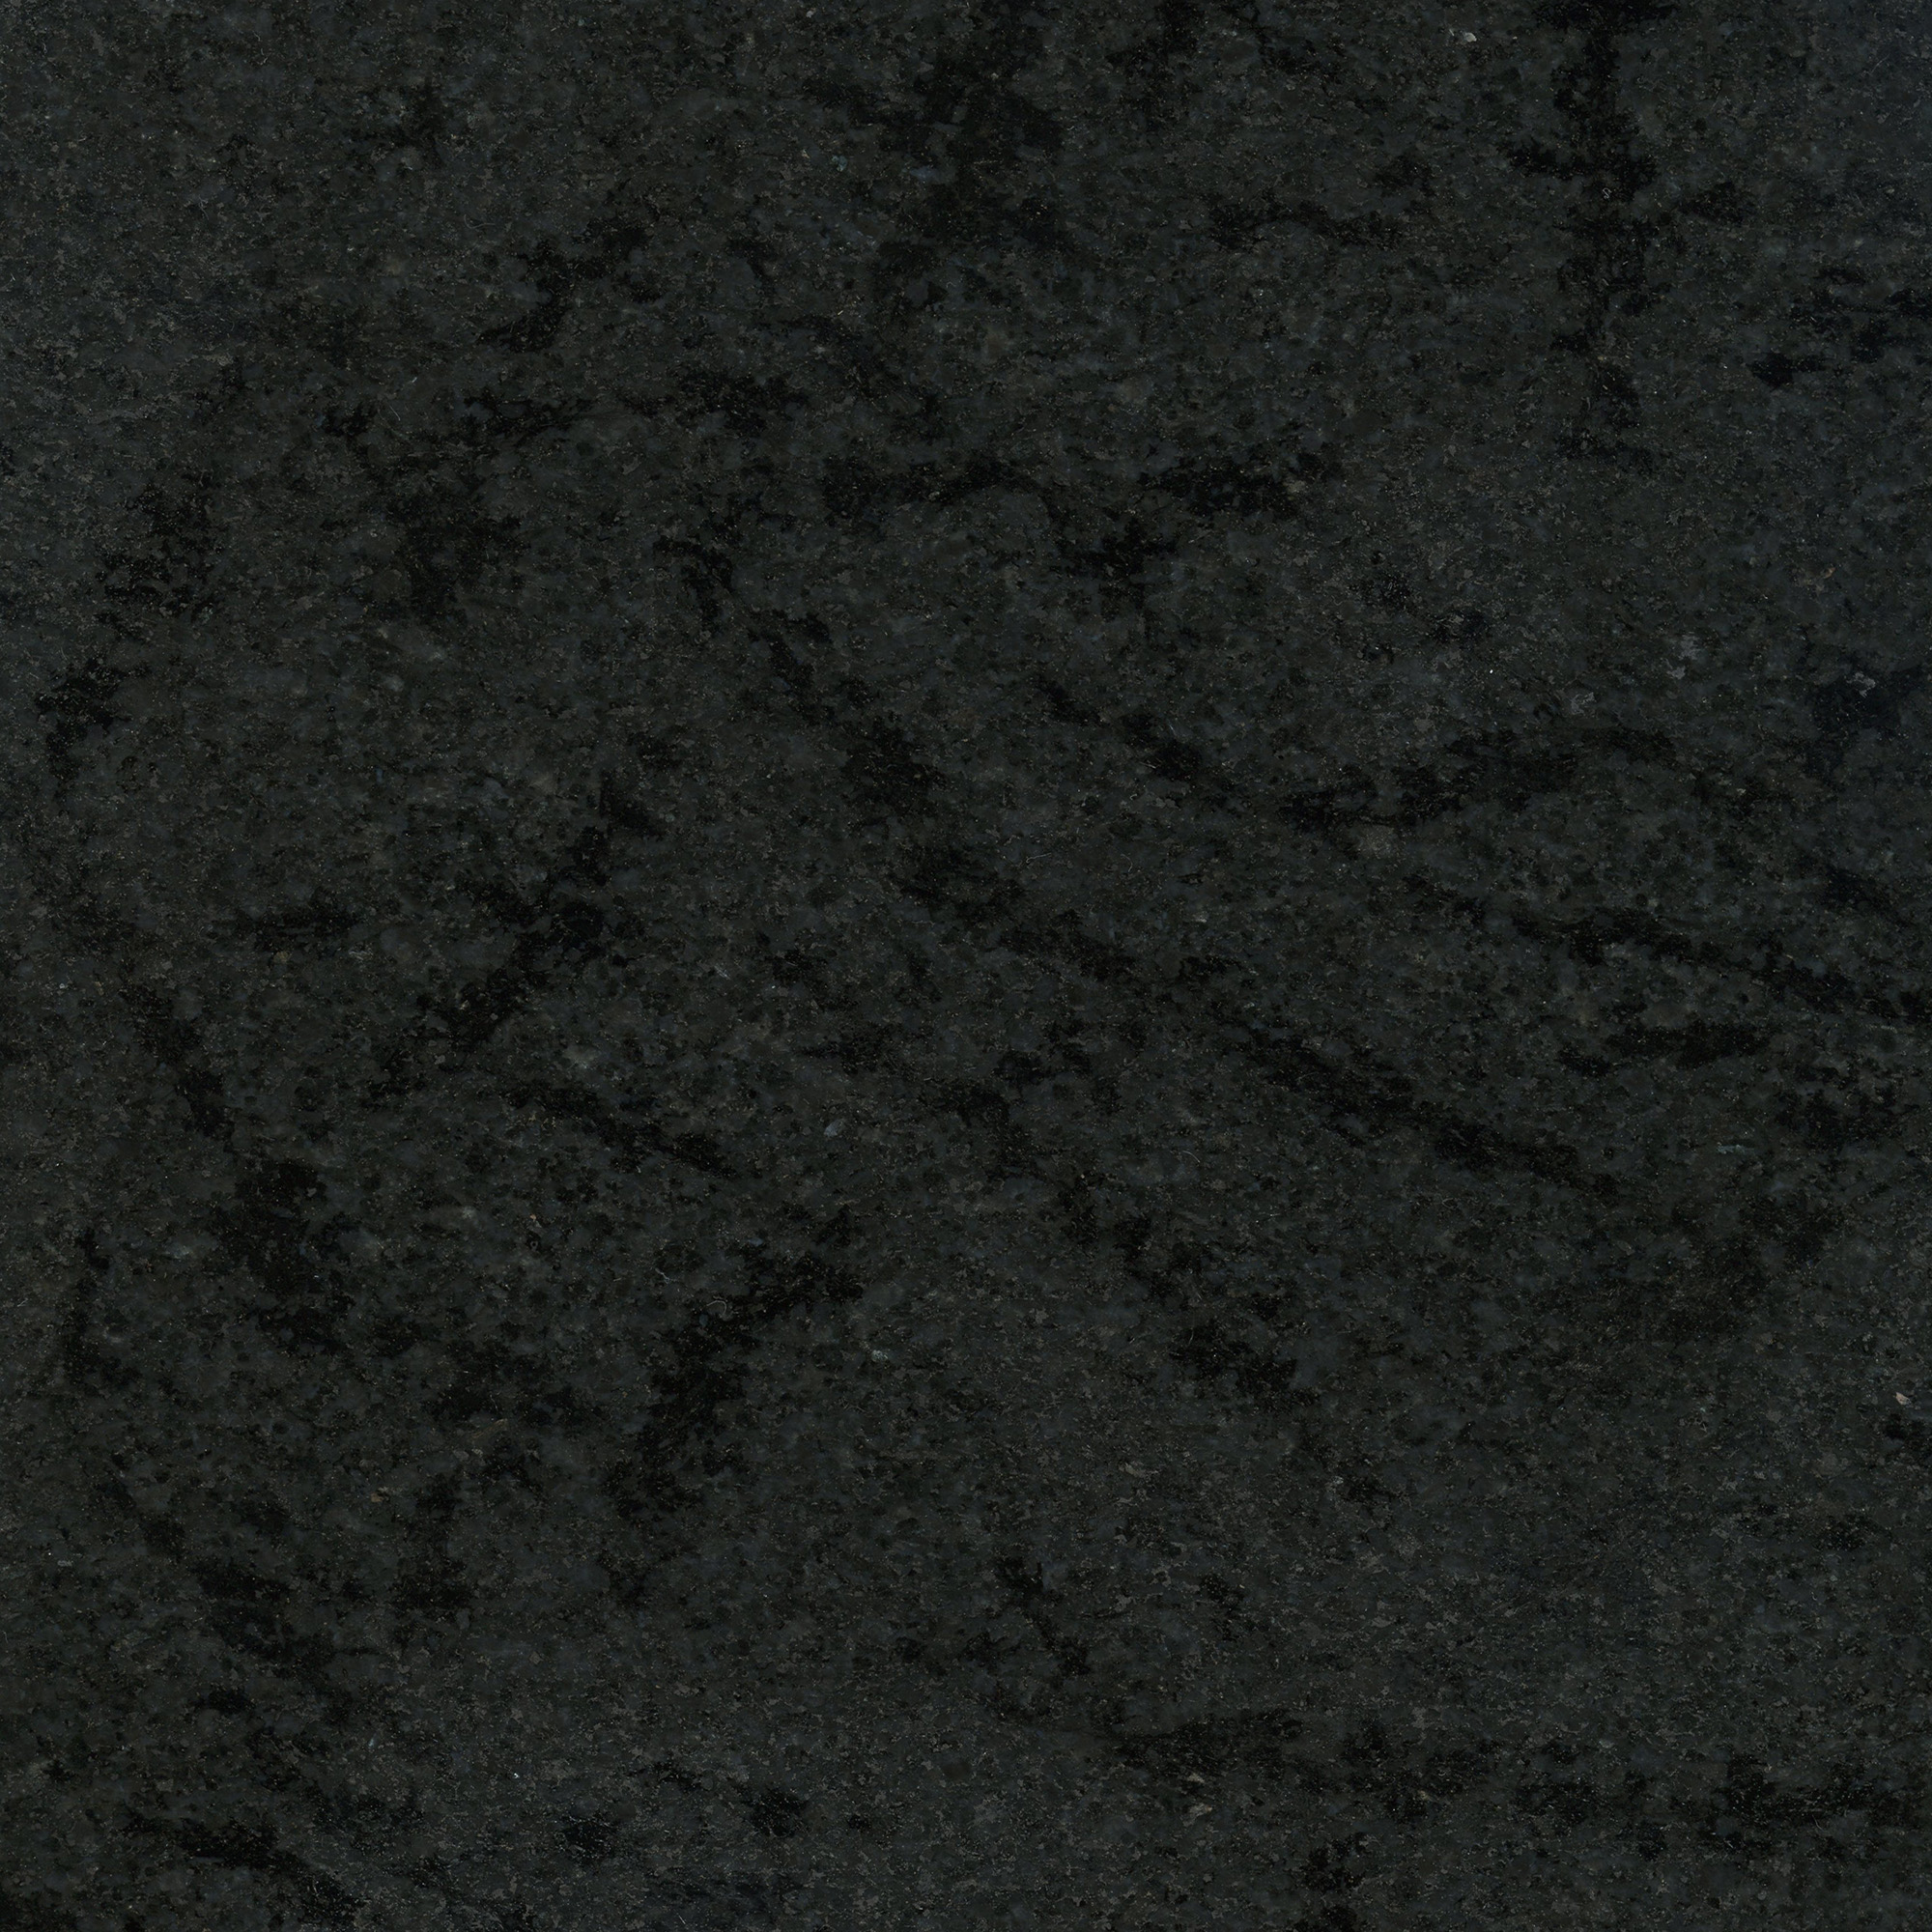 Klondike Black Diamond